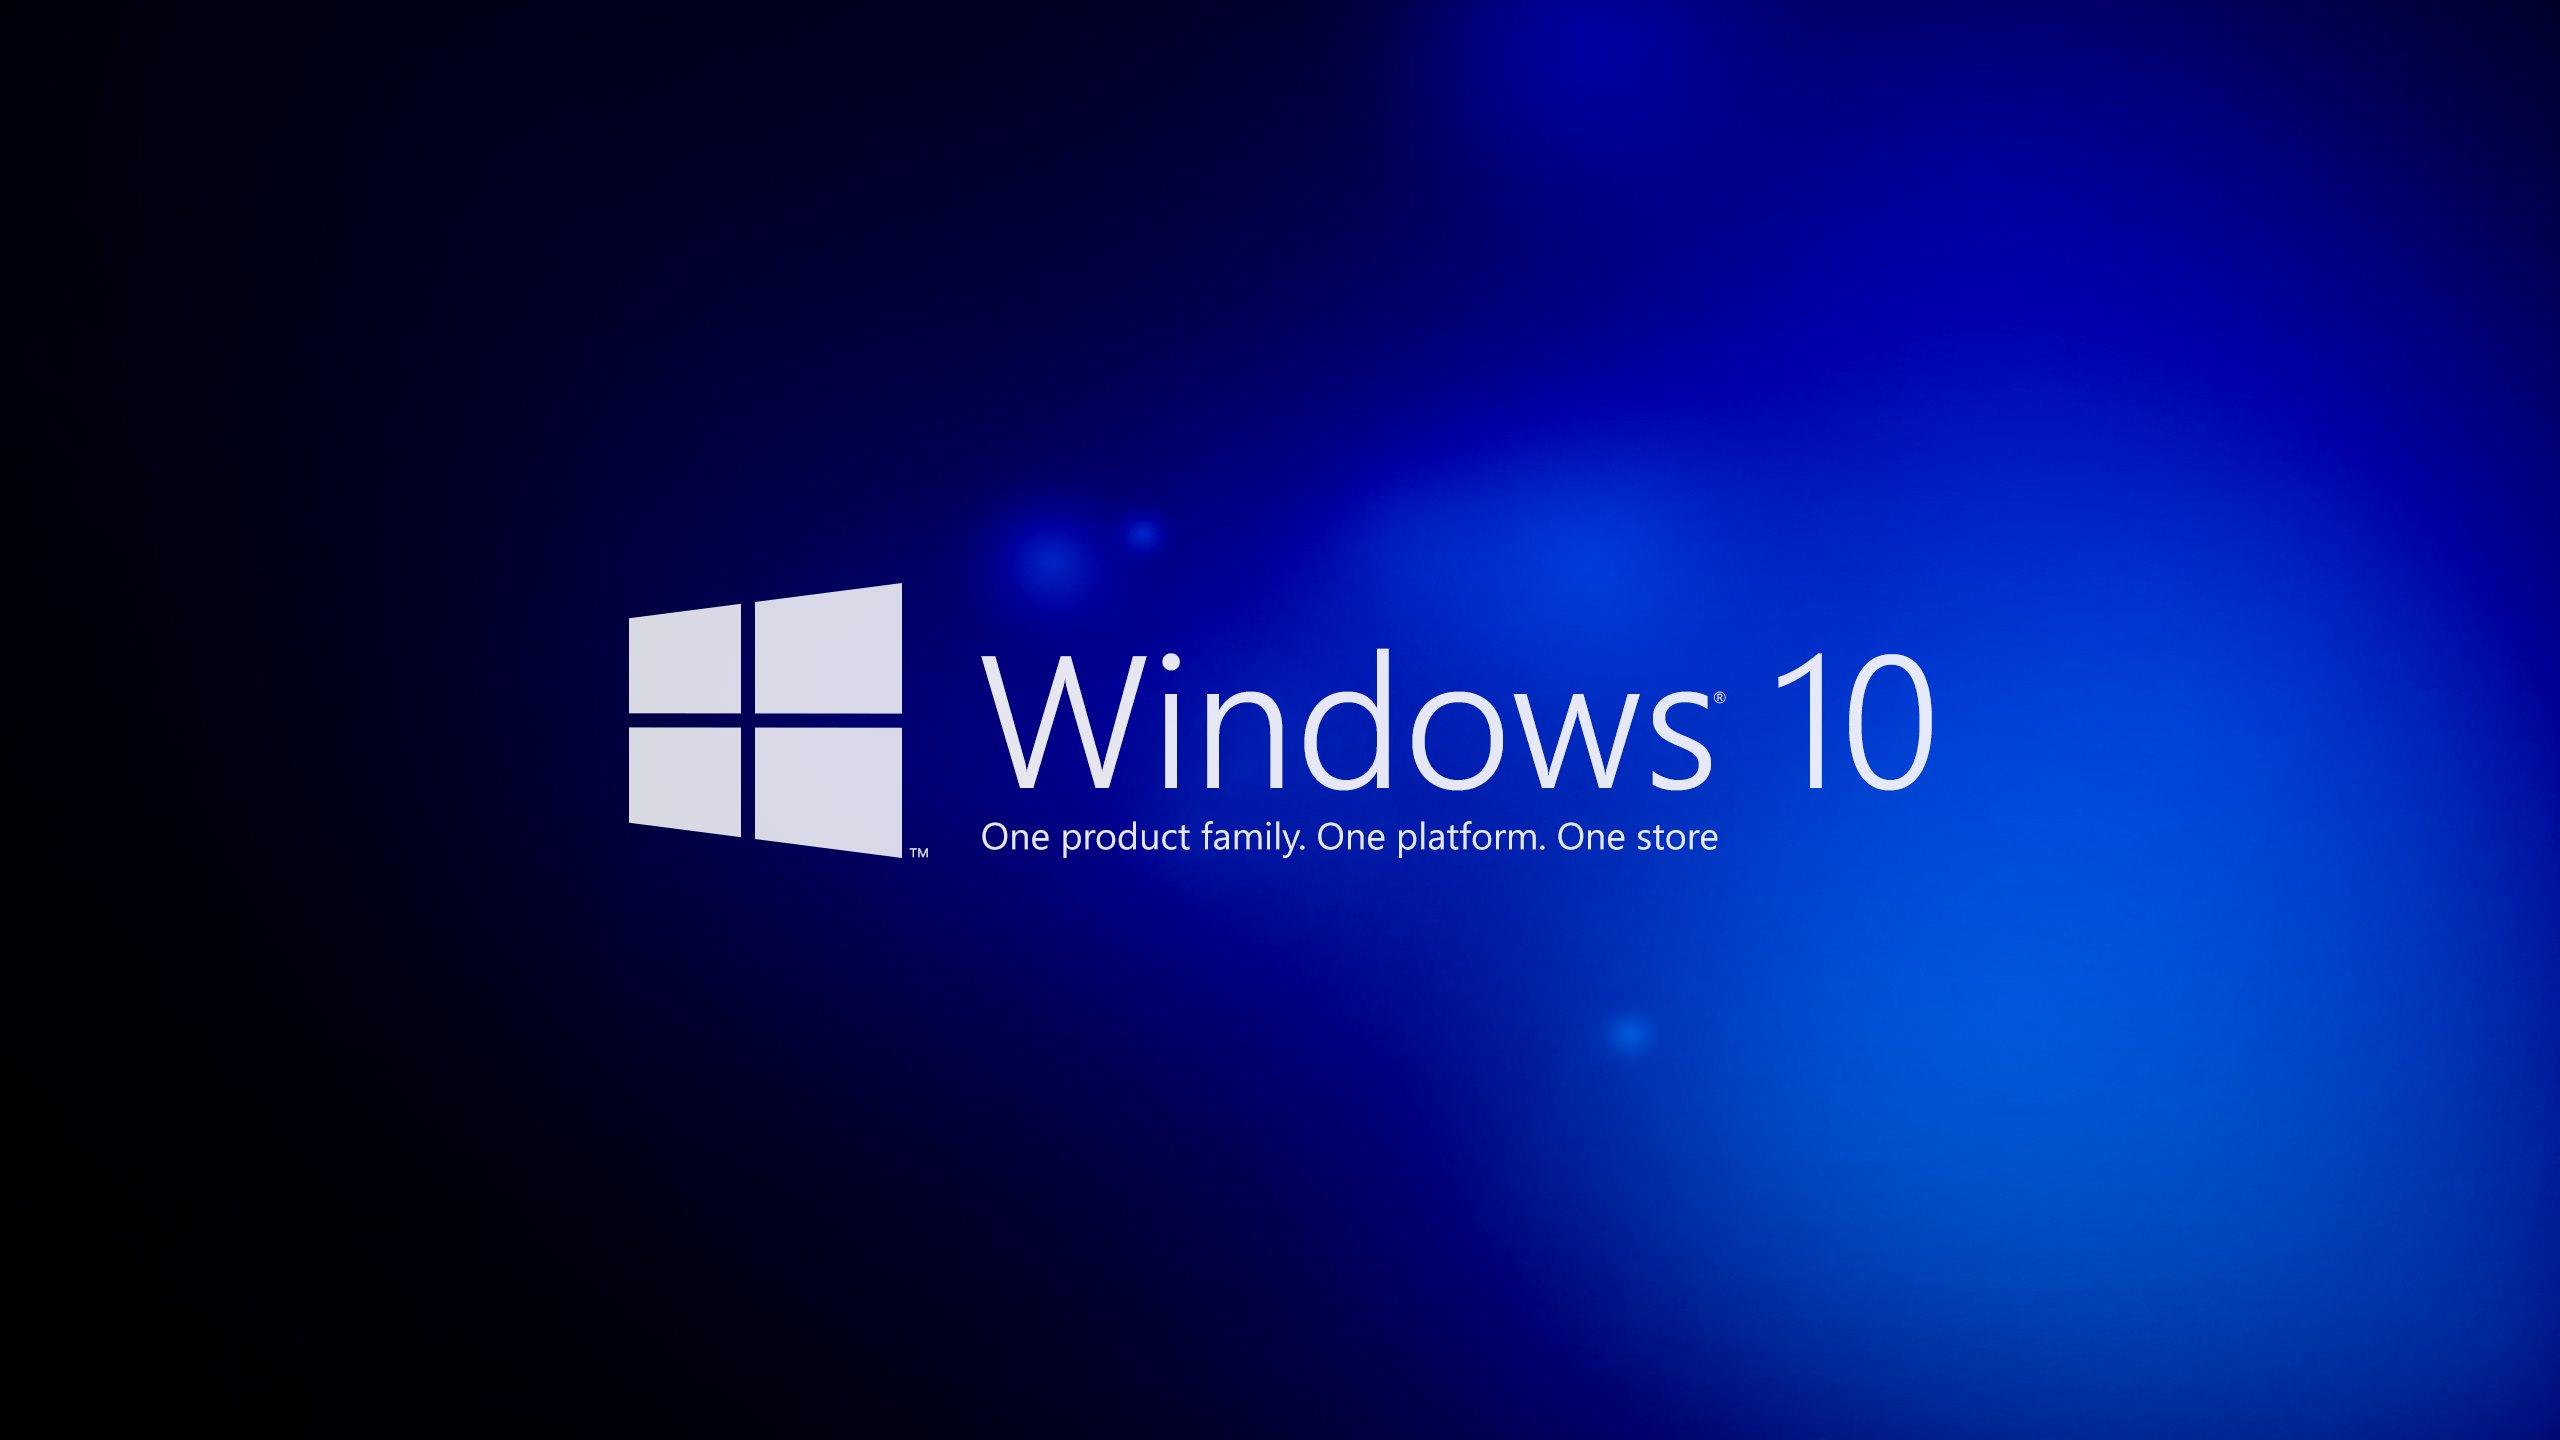 Windows 10 HD Wallpapers. 4K Wallpapers